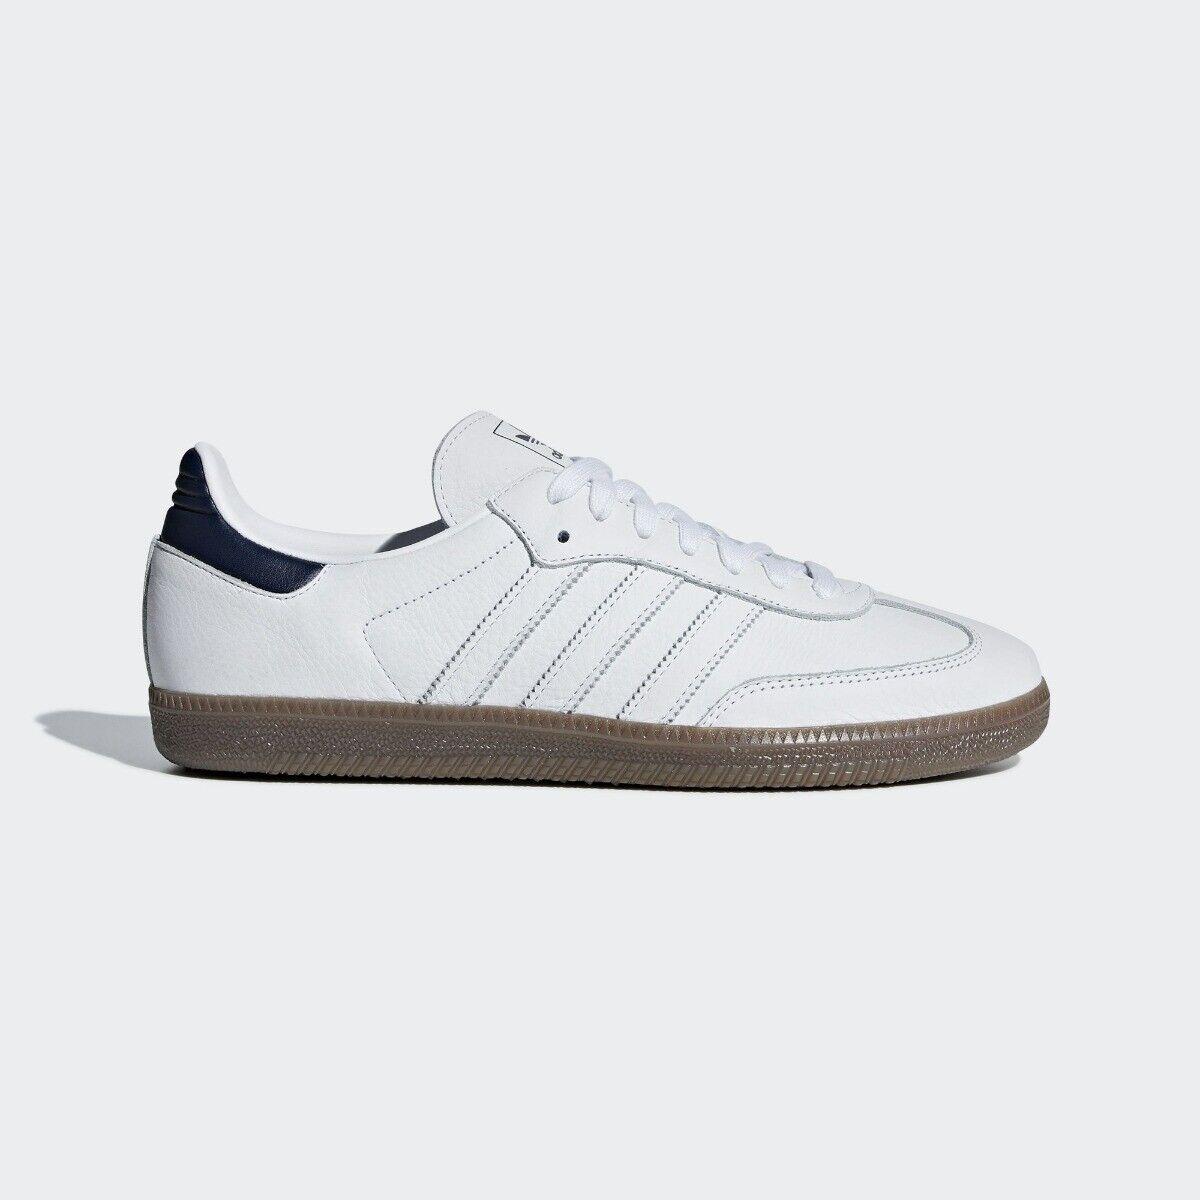 4cb32e41bdd6 Adidas Samba OG Mens Womens Trainer shoe UK Size 5 D96782